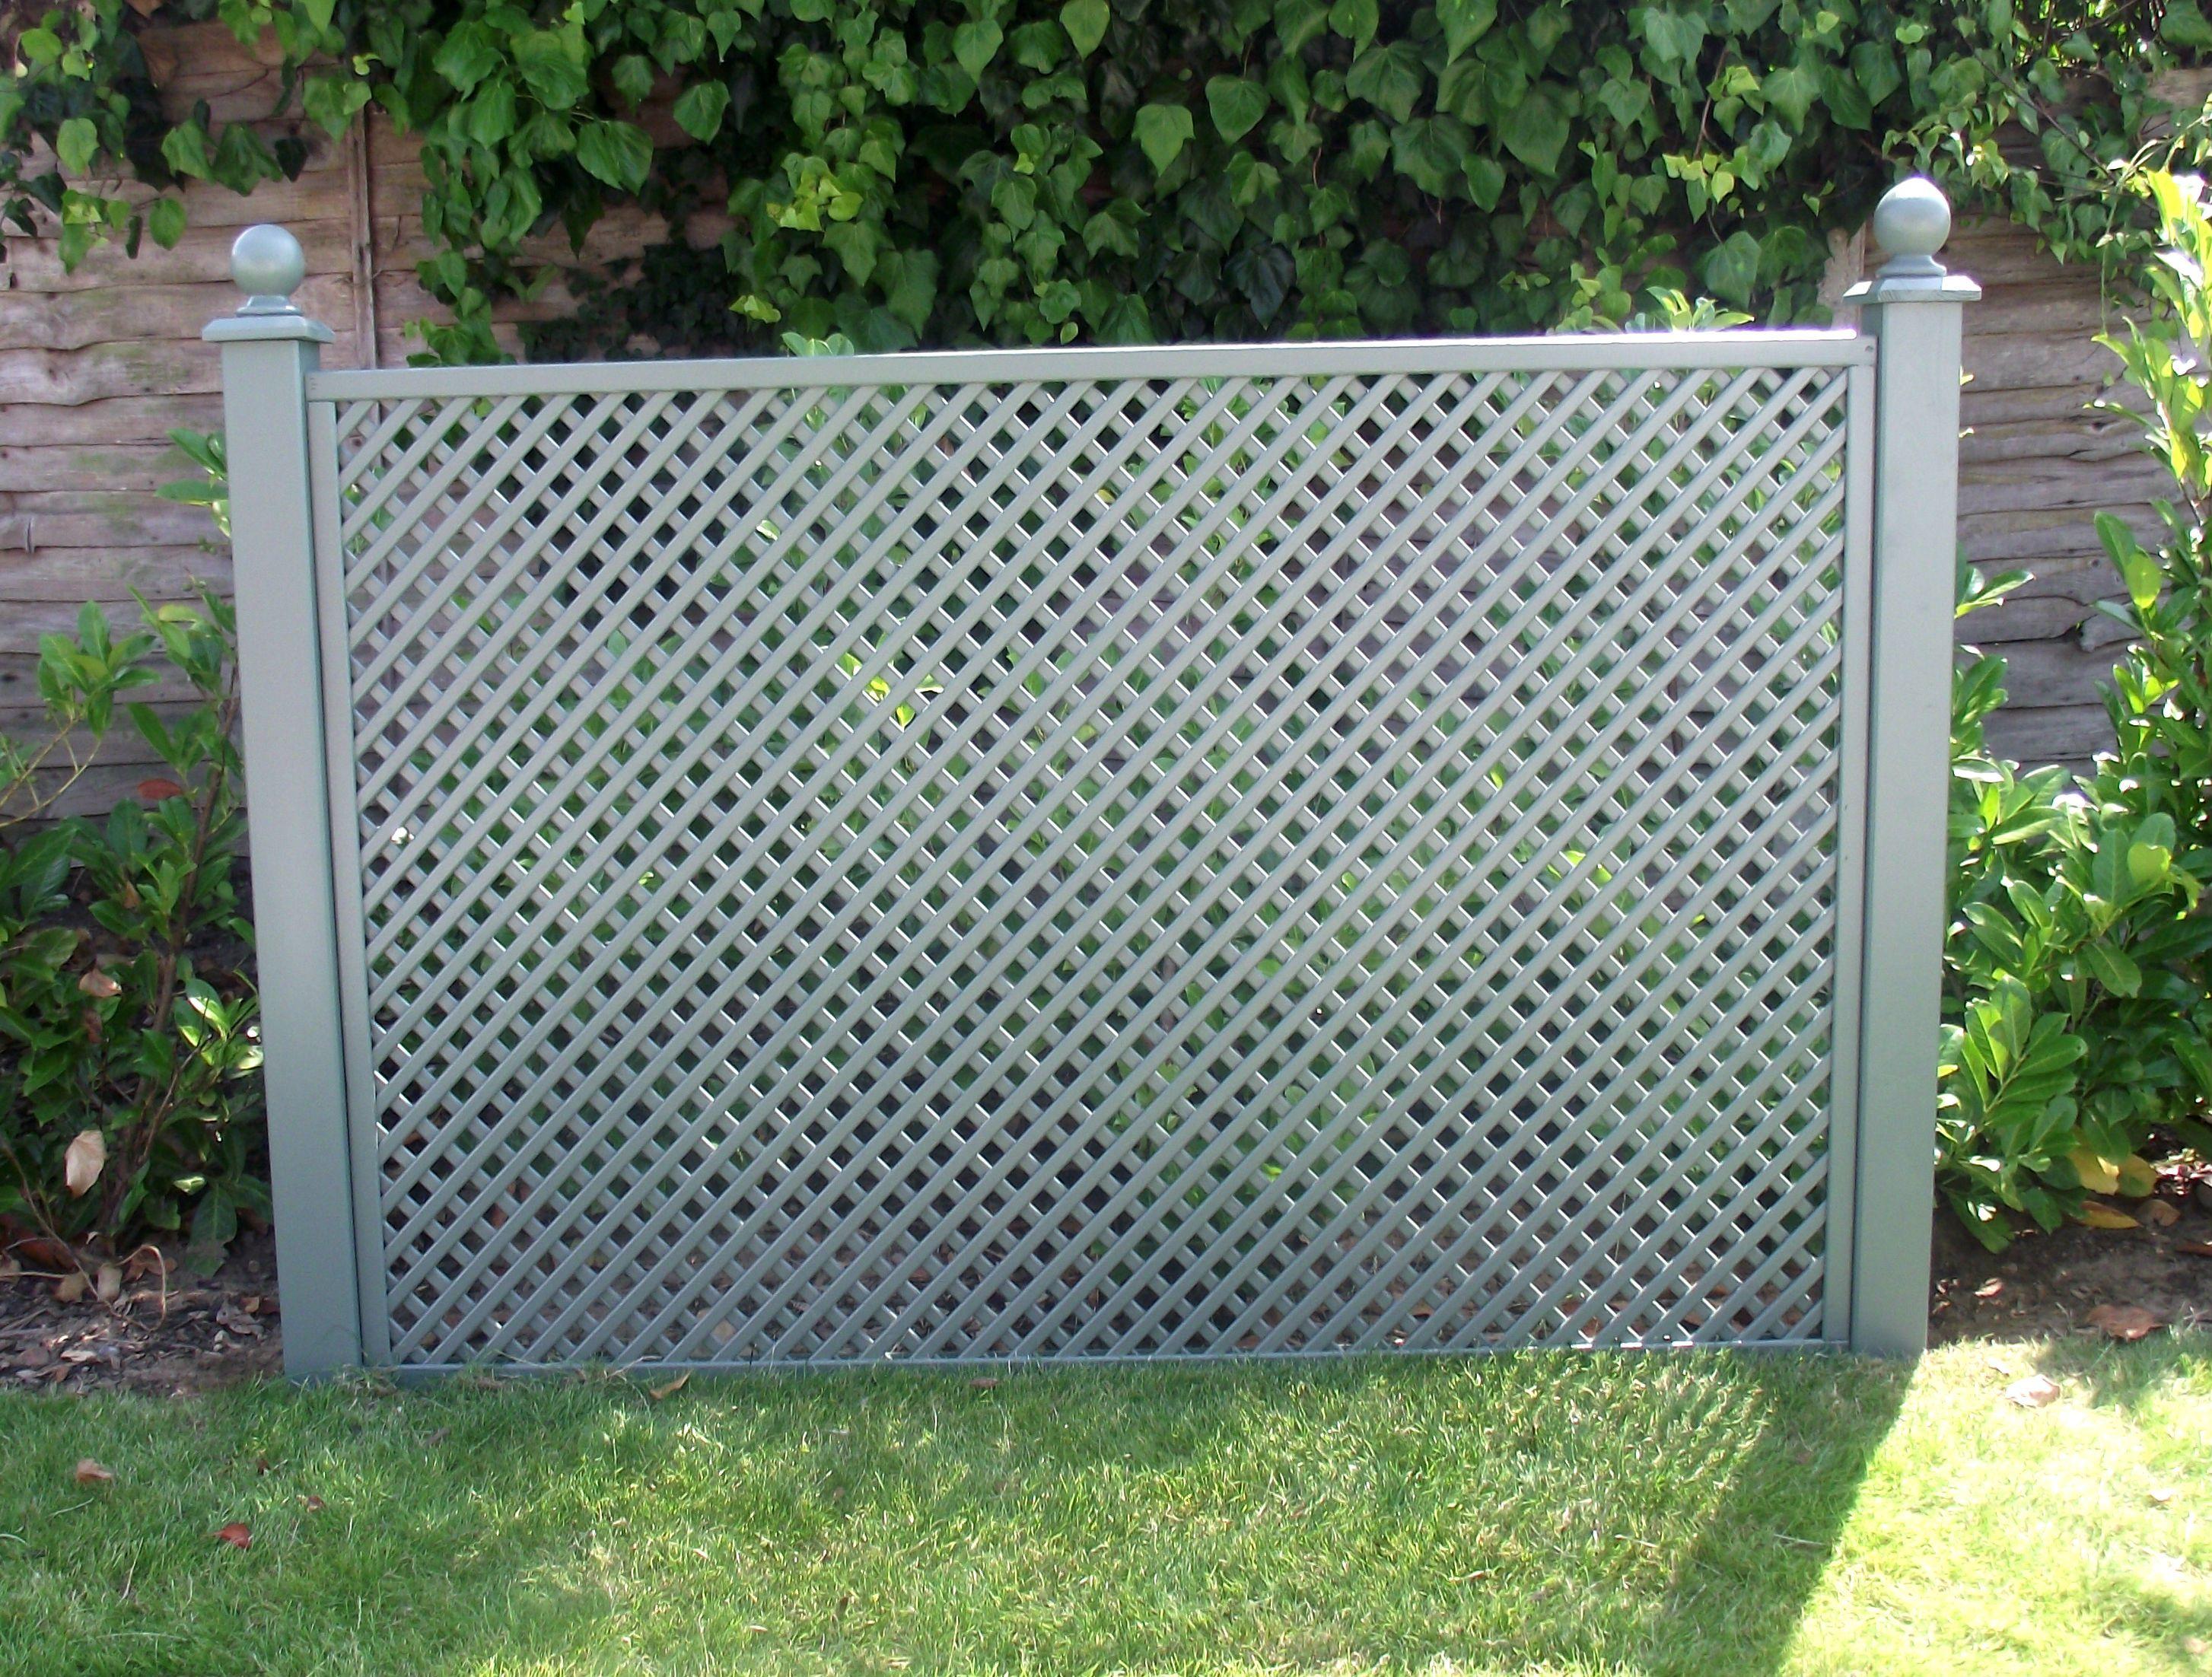 Diagonal trellis panel 40mm gap size pre painted garden diagonal trellis panel 40mm gap size pre painted garden trellis direct baanklon Gallery